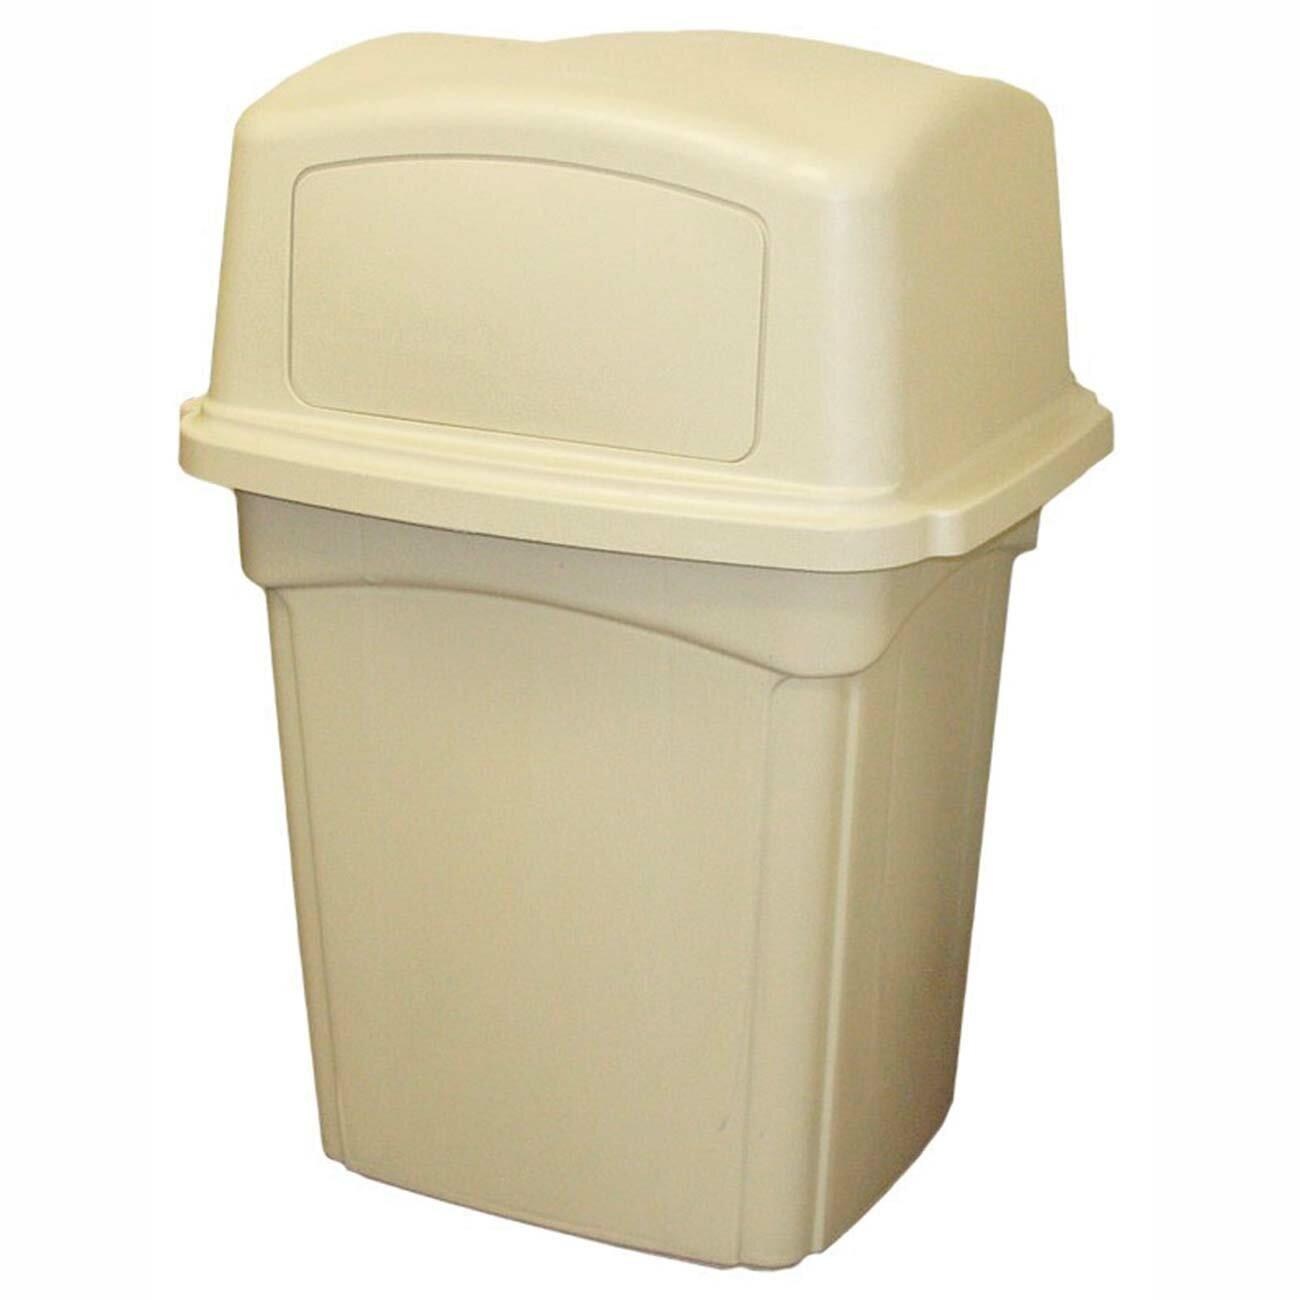 Continental Mfg Co Receptacle 45 Gallon Trash Can Wayfair